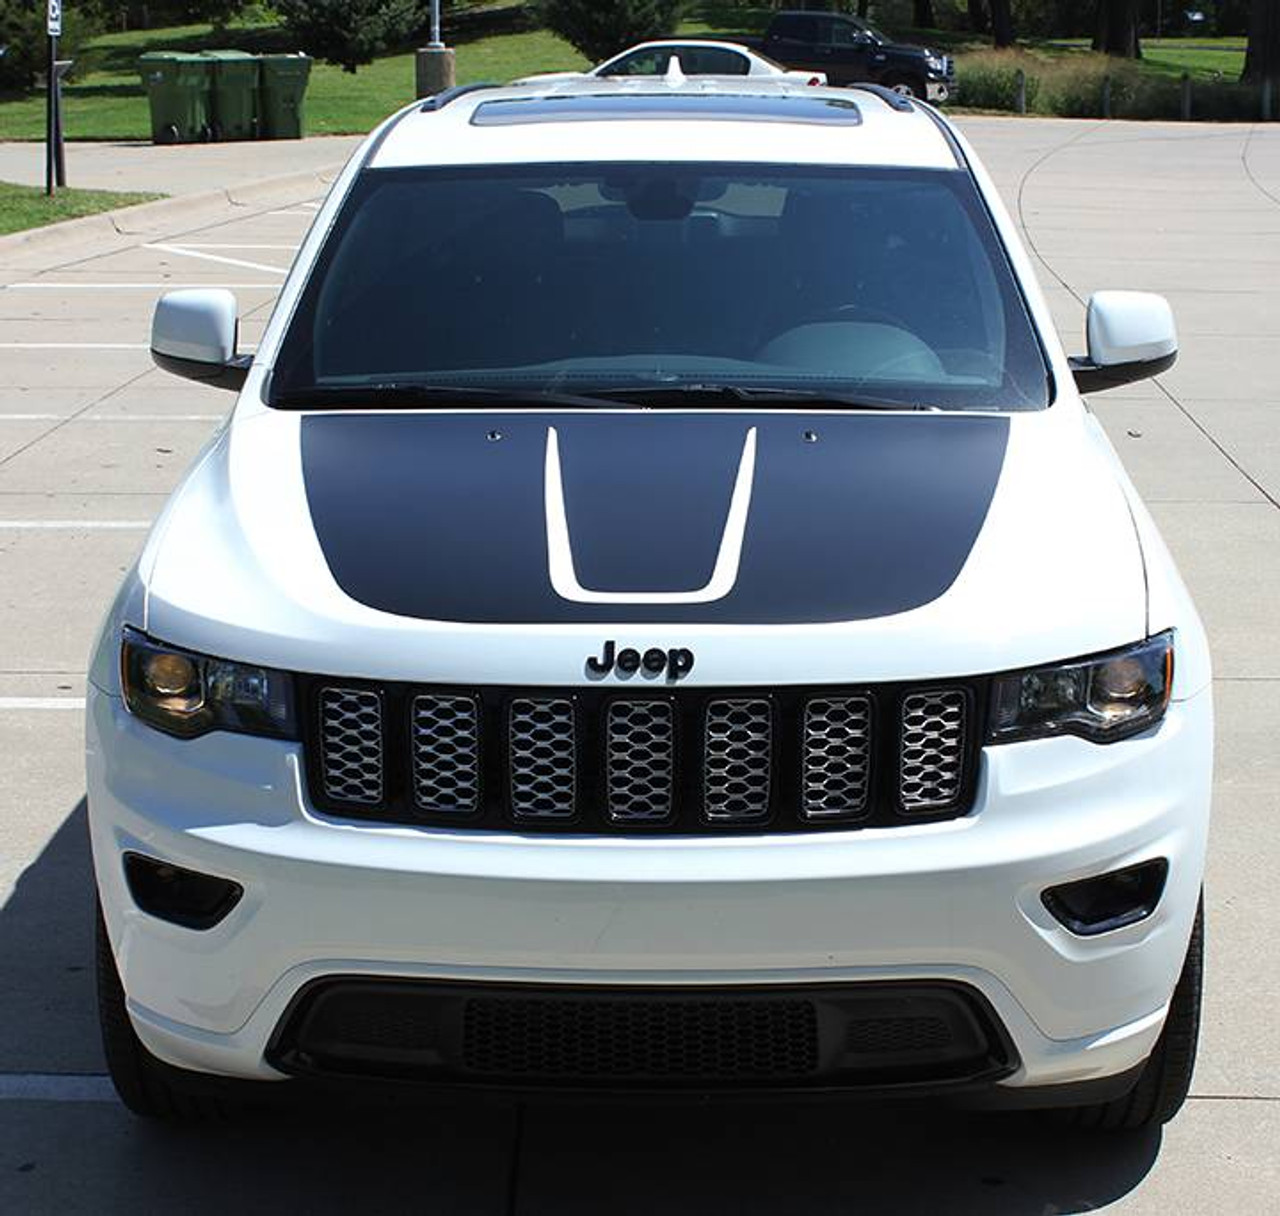 White Grand Cherokee >> Jeep Grand Cherokee Hood Stripe Trail Hood 2011 2019 2020 3m Standard Wet Install